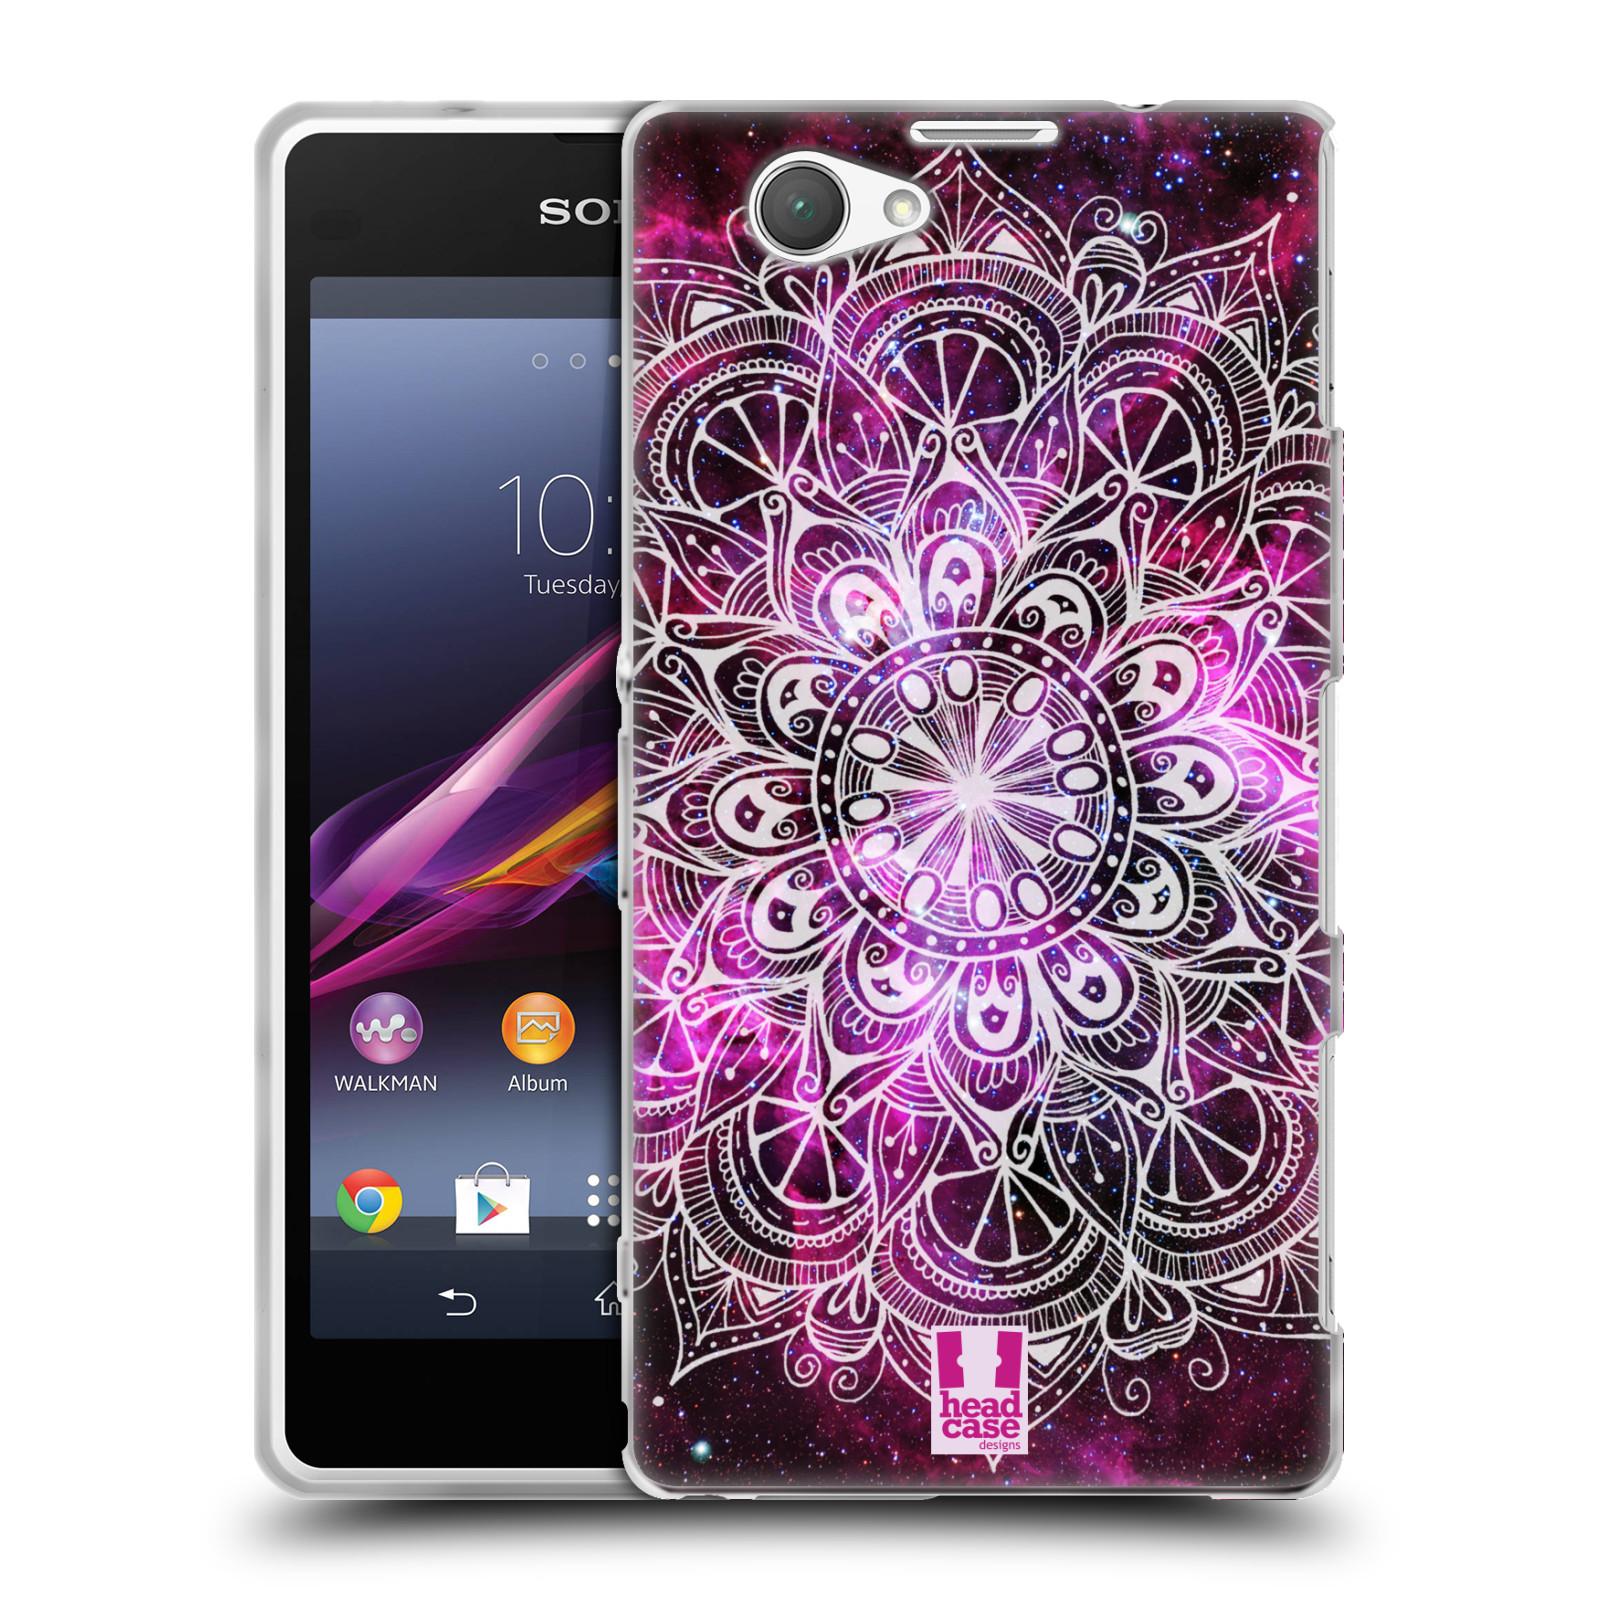 Silikonové pouzdro na mobil Sony Xperia Z1 Compact D5503 HEAD CASE Mandala Doodle Nebula (Silikonový kryt či obal na mobilní telefon Sony Xperia Z1 Compact)